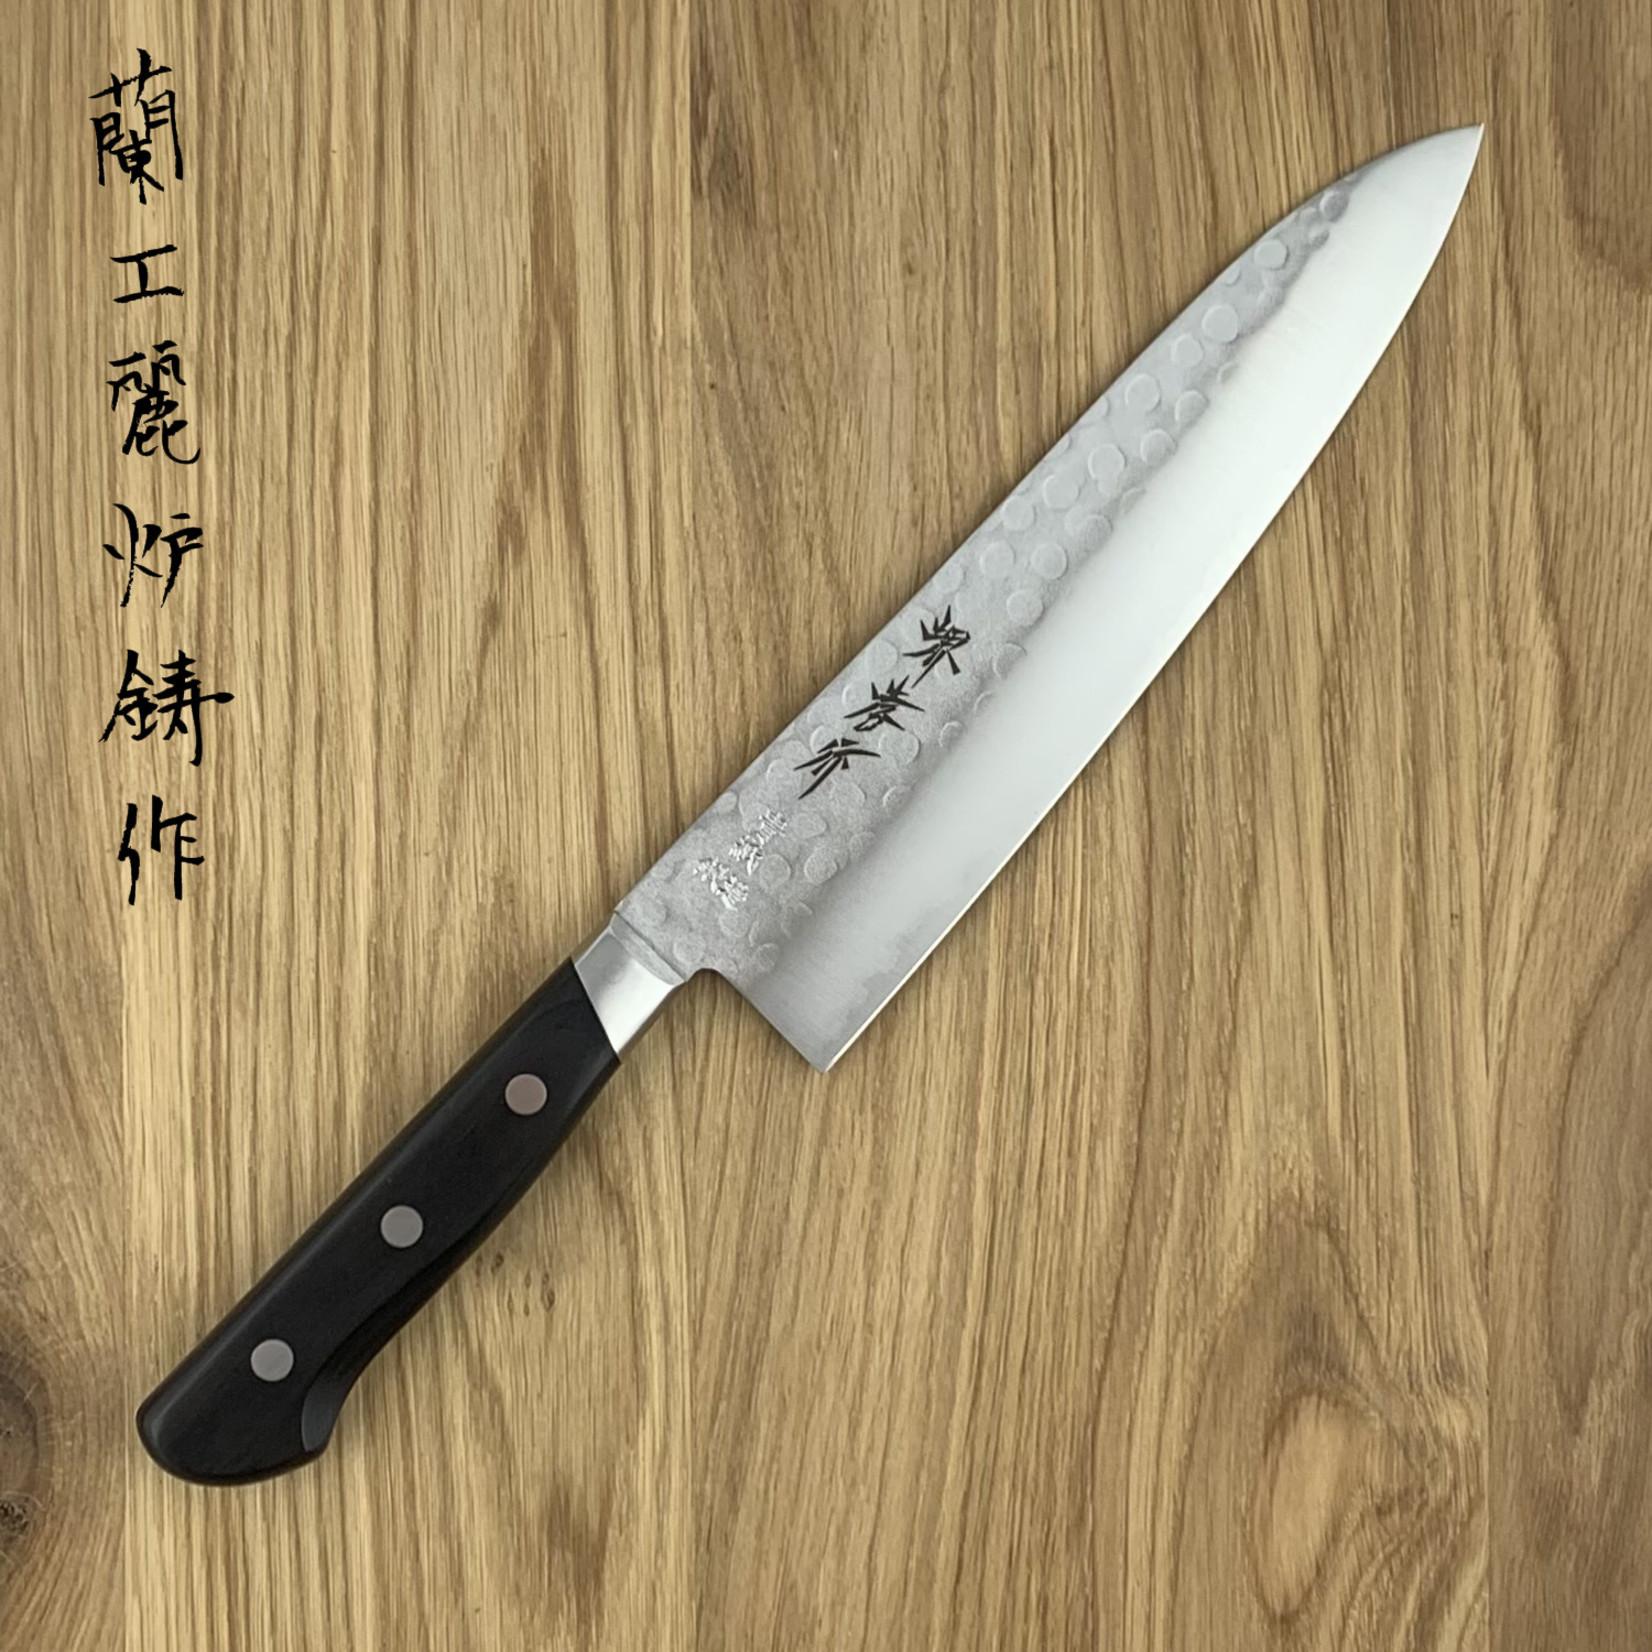 SAKAI TAKAYUKI Blue #2 Pakka Handle Gyuto 200 mm 07208